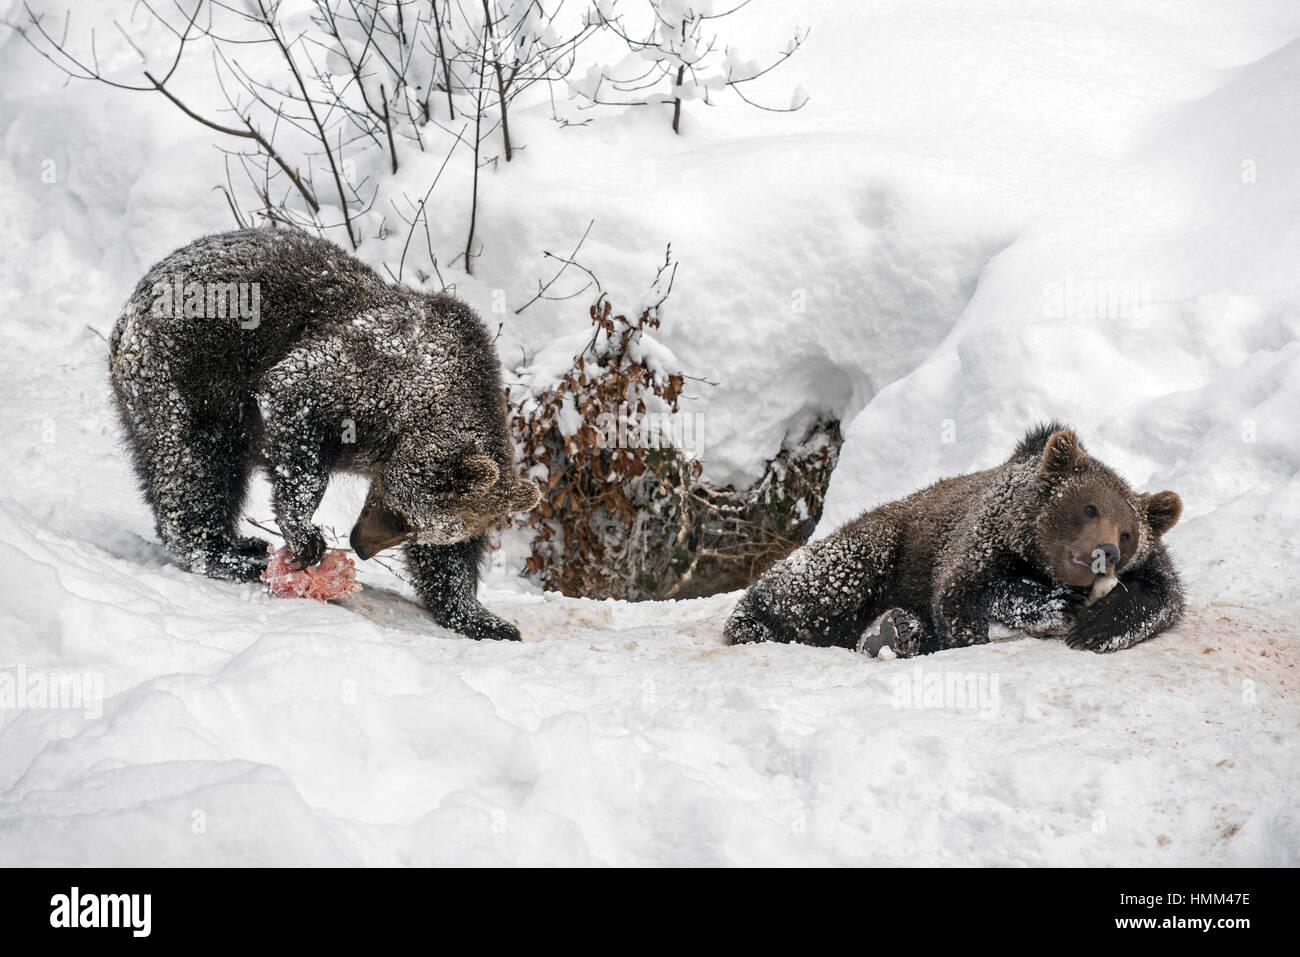 Brown Bear Cubs Eating Stockfotos & Brown Bear Cubs Eating Bilder ...